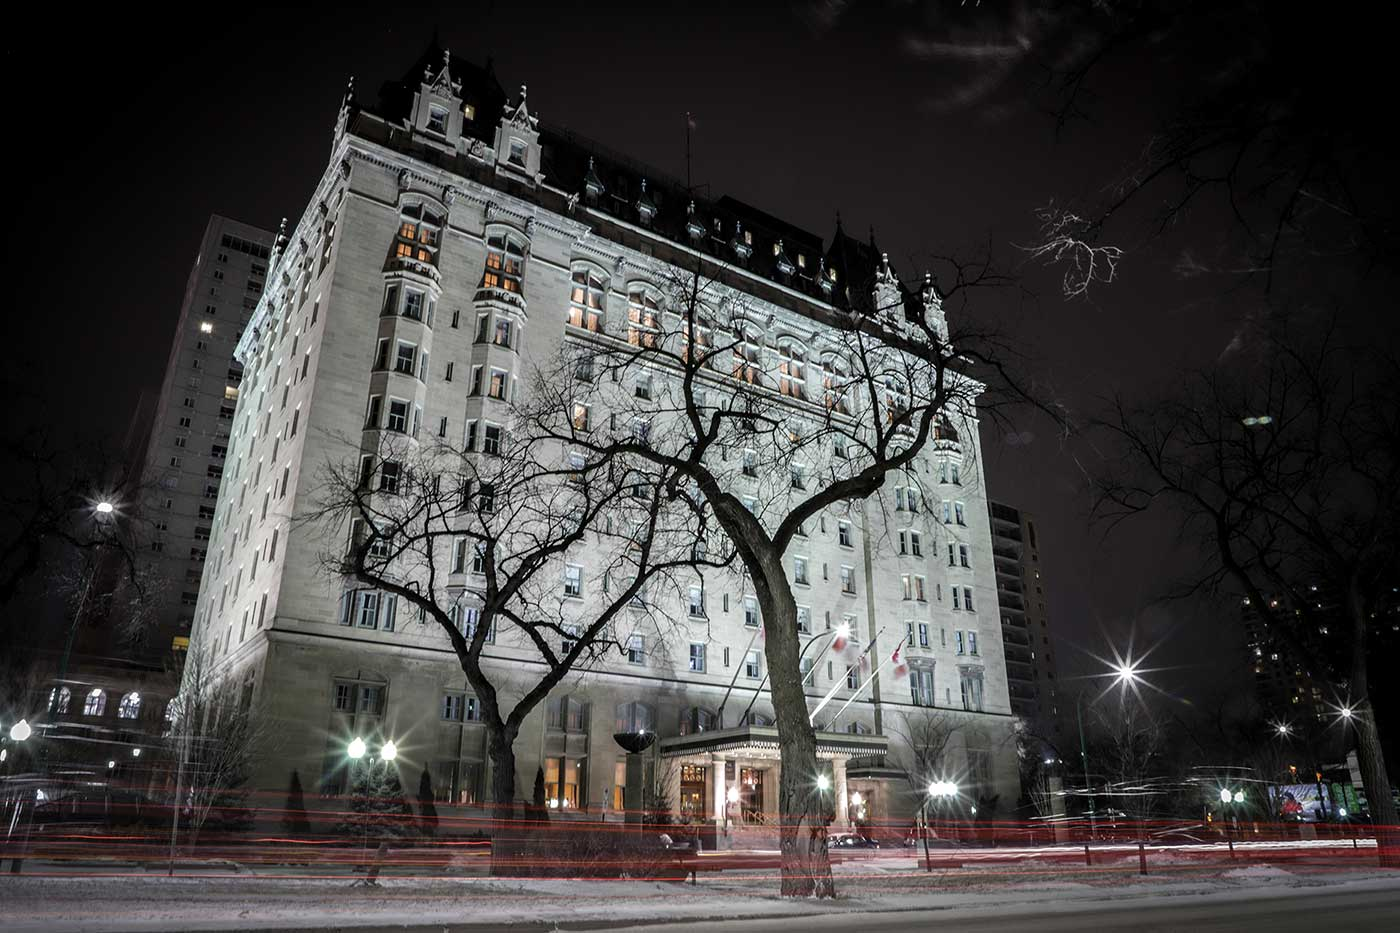 Fort Garry Hotel at night. Winnipeg, Canada.